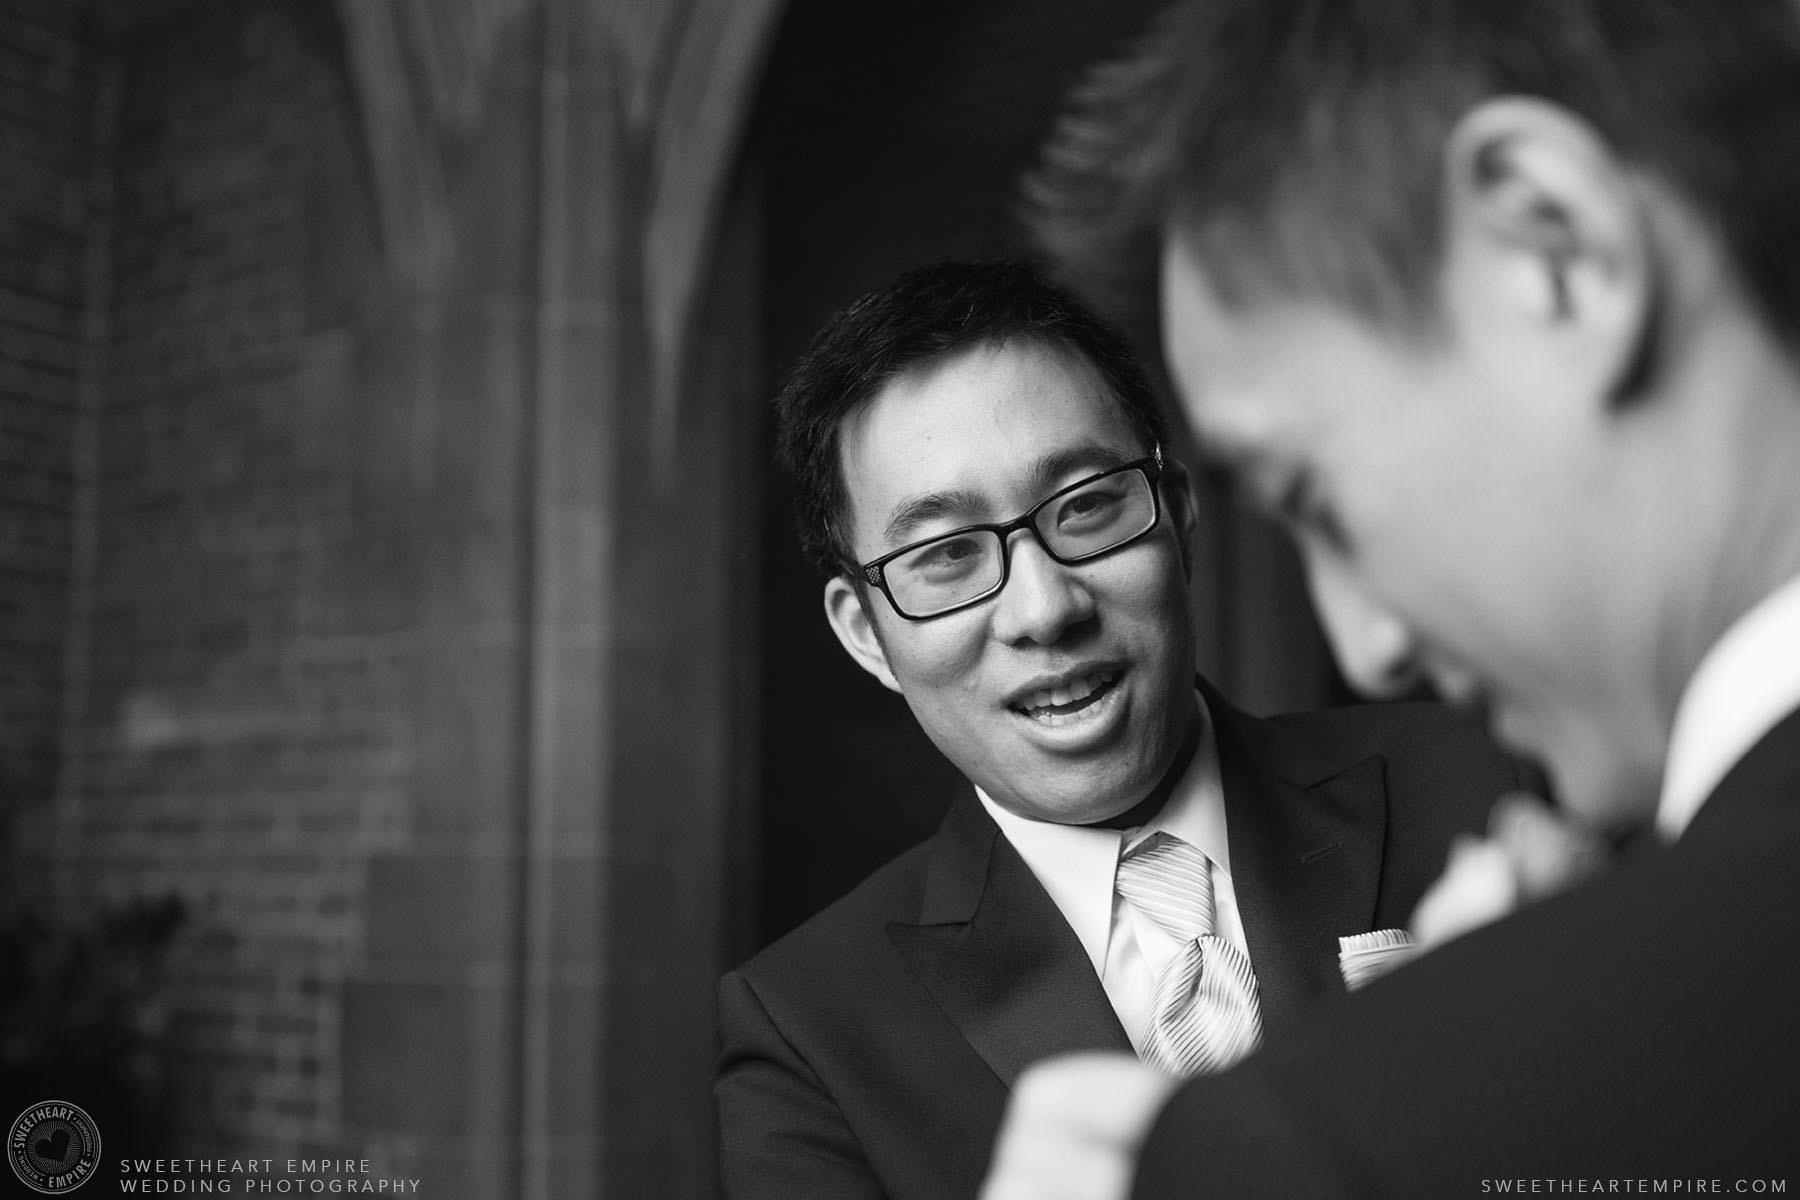 Best man helping the groom get ready, Hart House University of Toronto Wedding